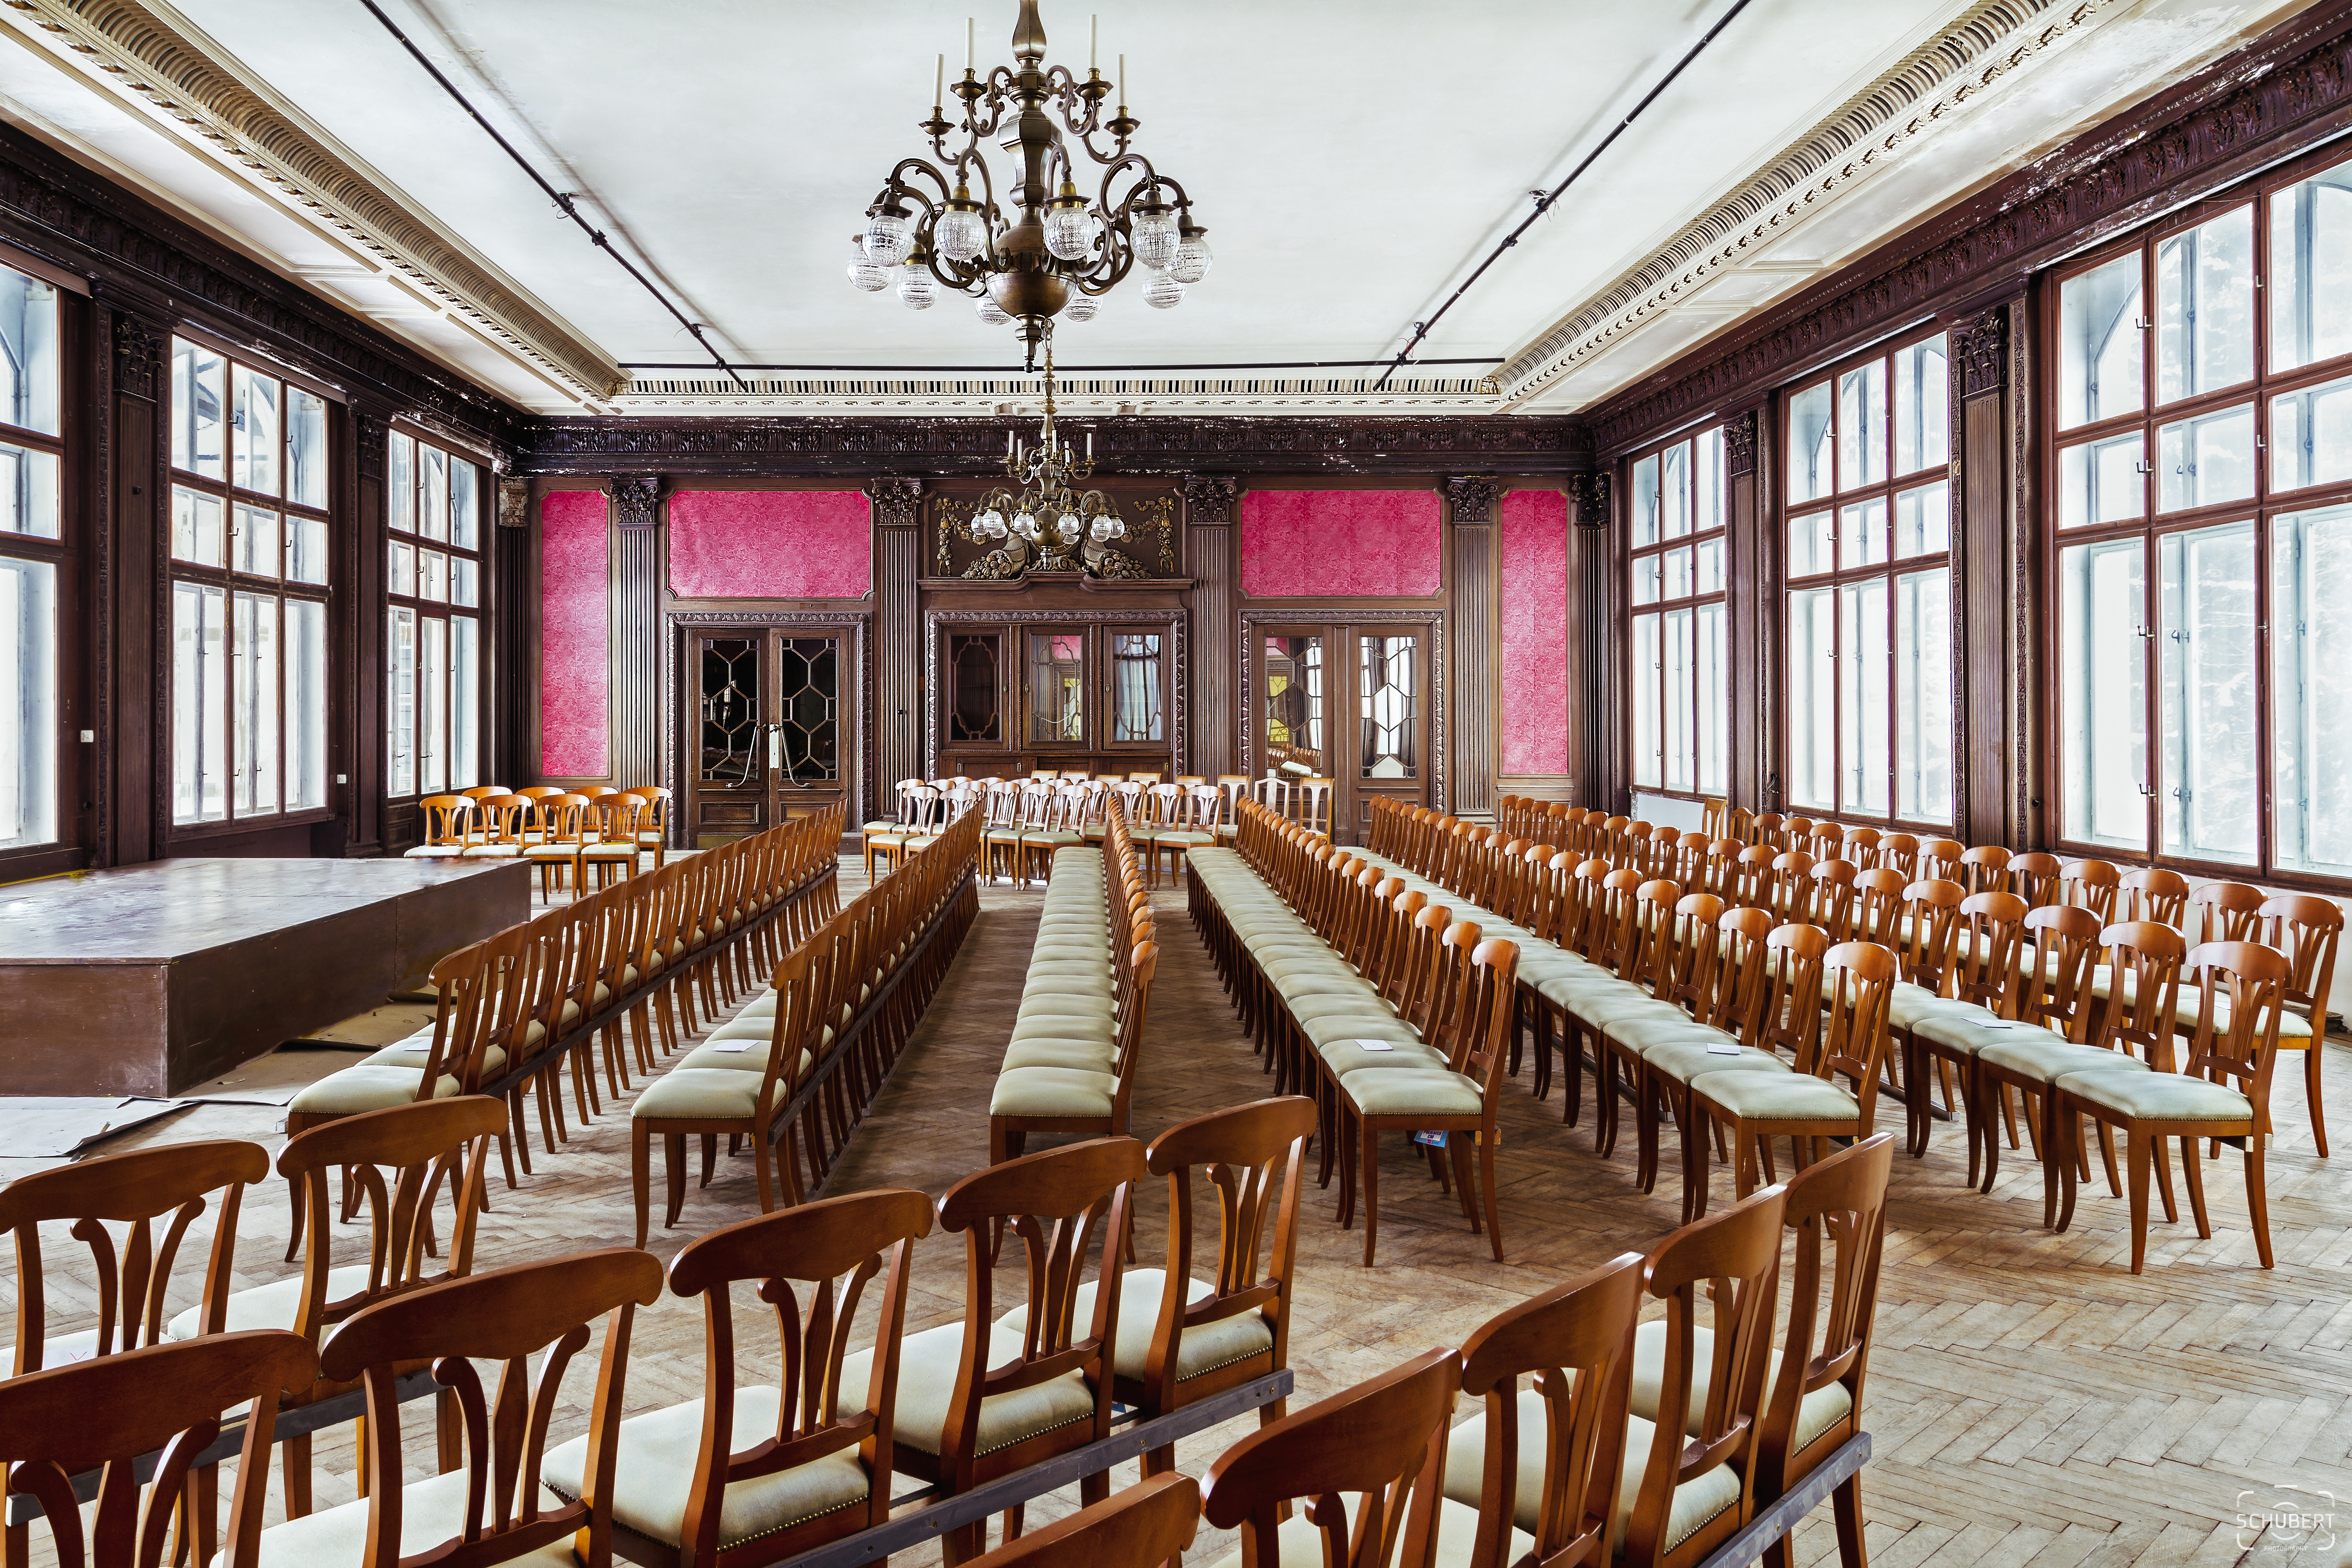 SBH_Waldhofsaal Gesamtansicht_Copyright